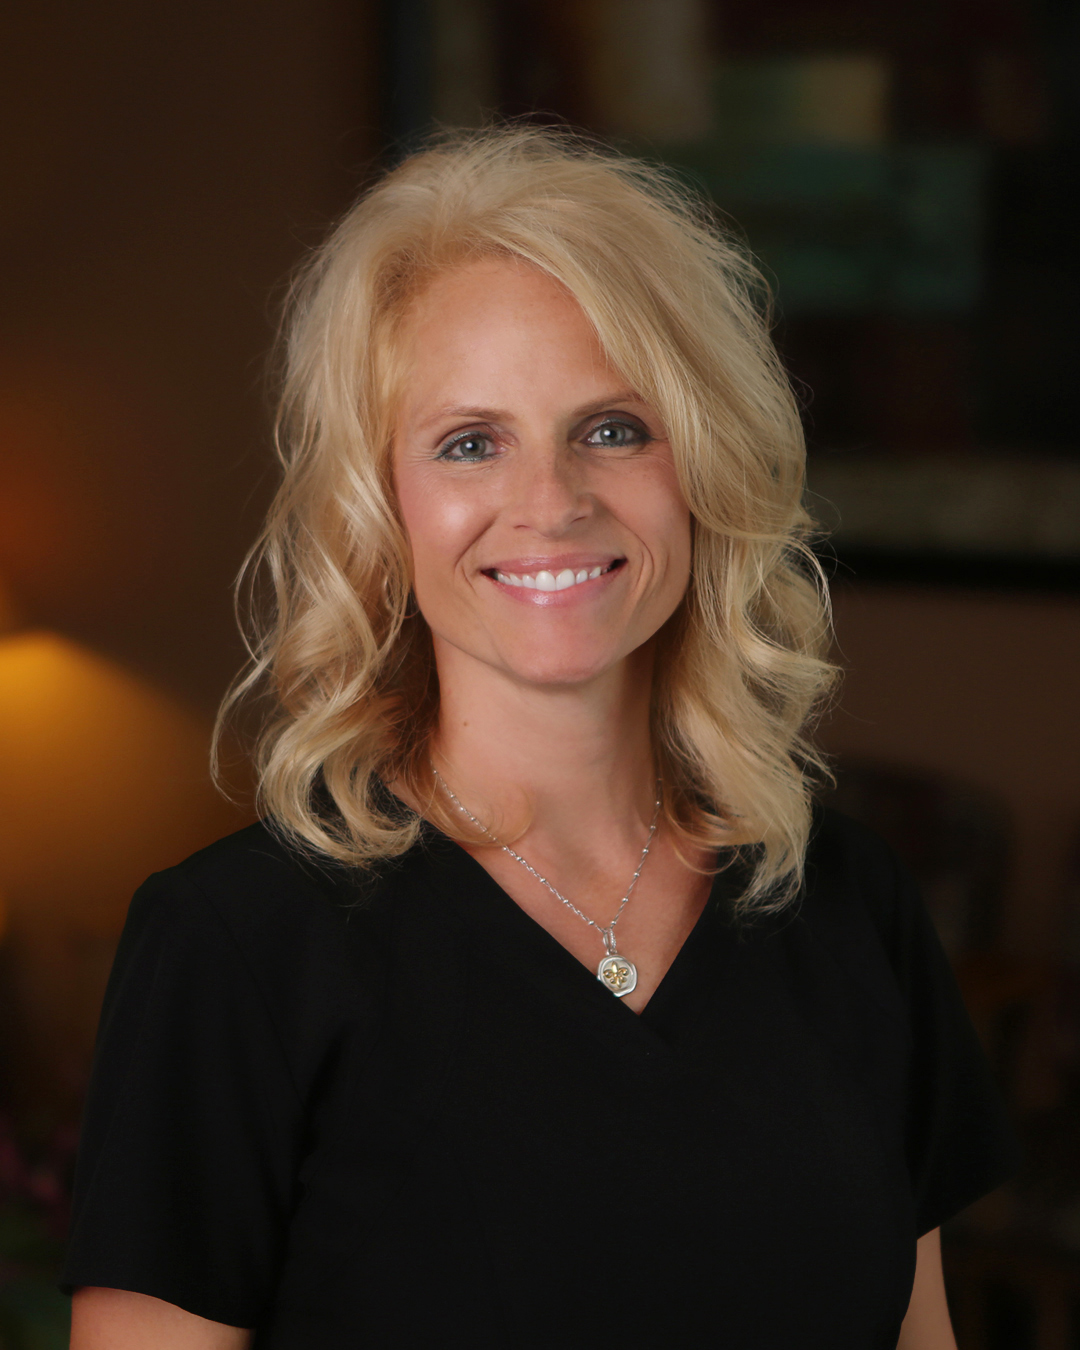 Ursula O'Neal Dental Hygienist